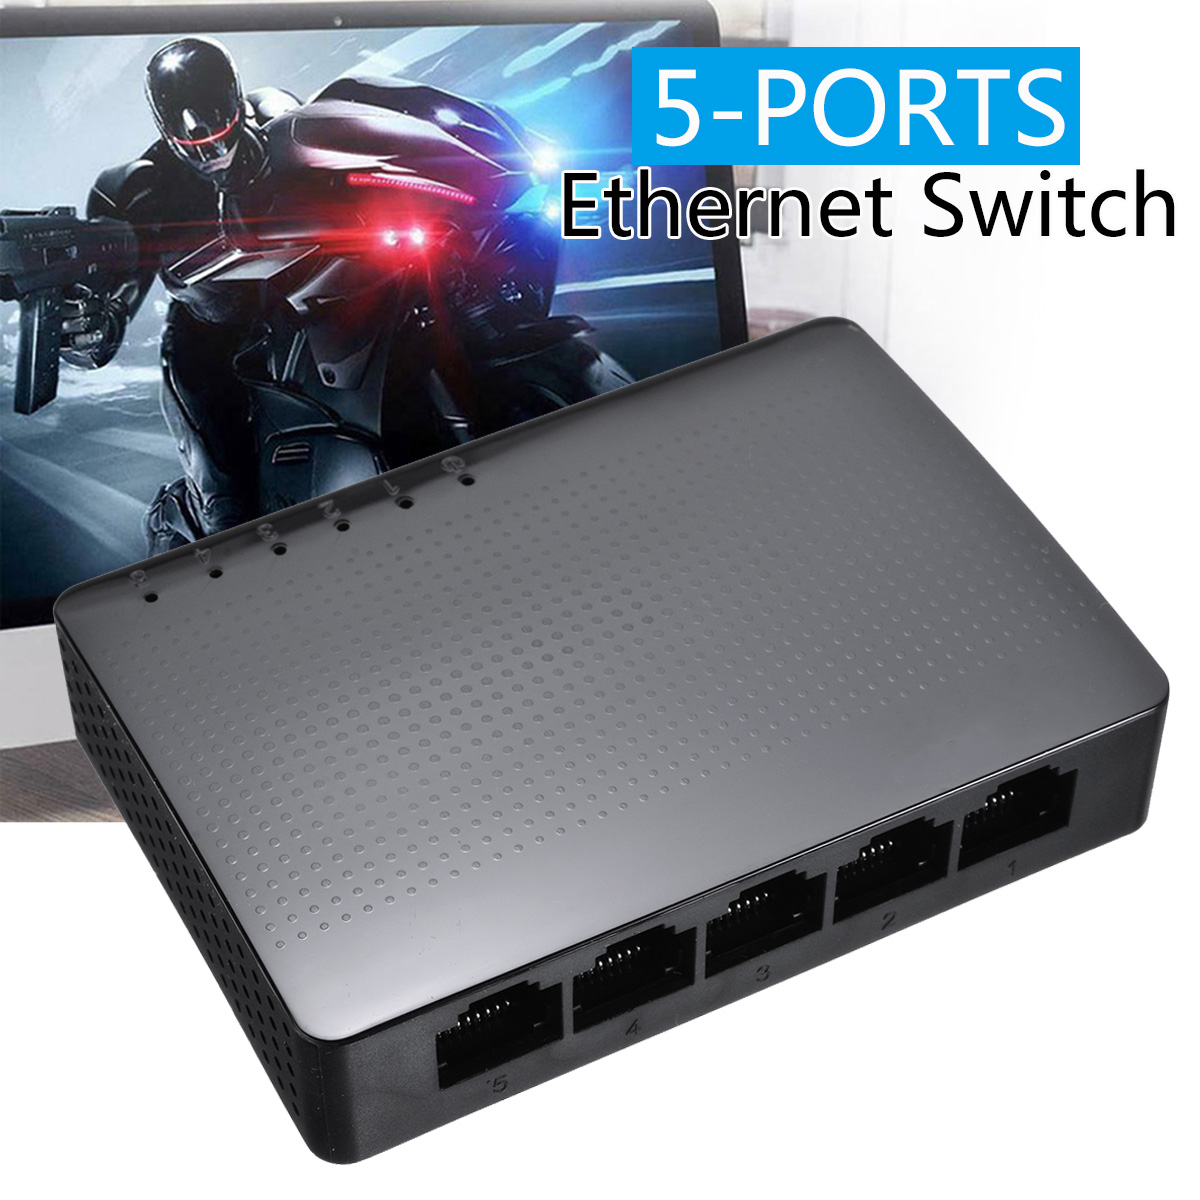 High Quality Ten-da LAN Hub SG105 5-port Desktop Gigabit Network Switch Ethernet Switches Wireless Router 1000M US Power Adapter